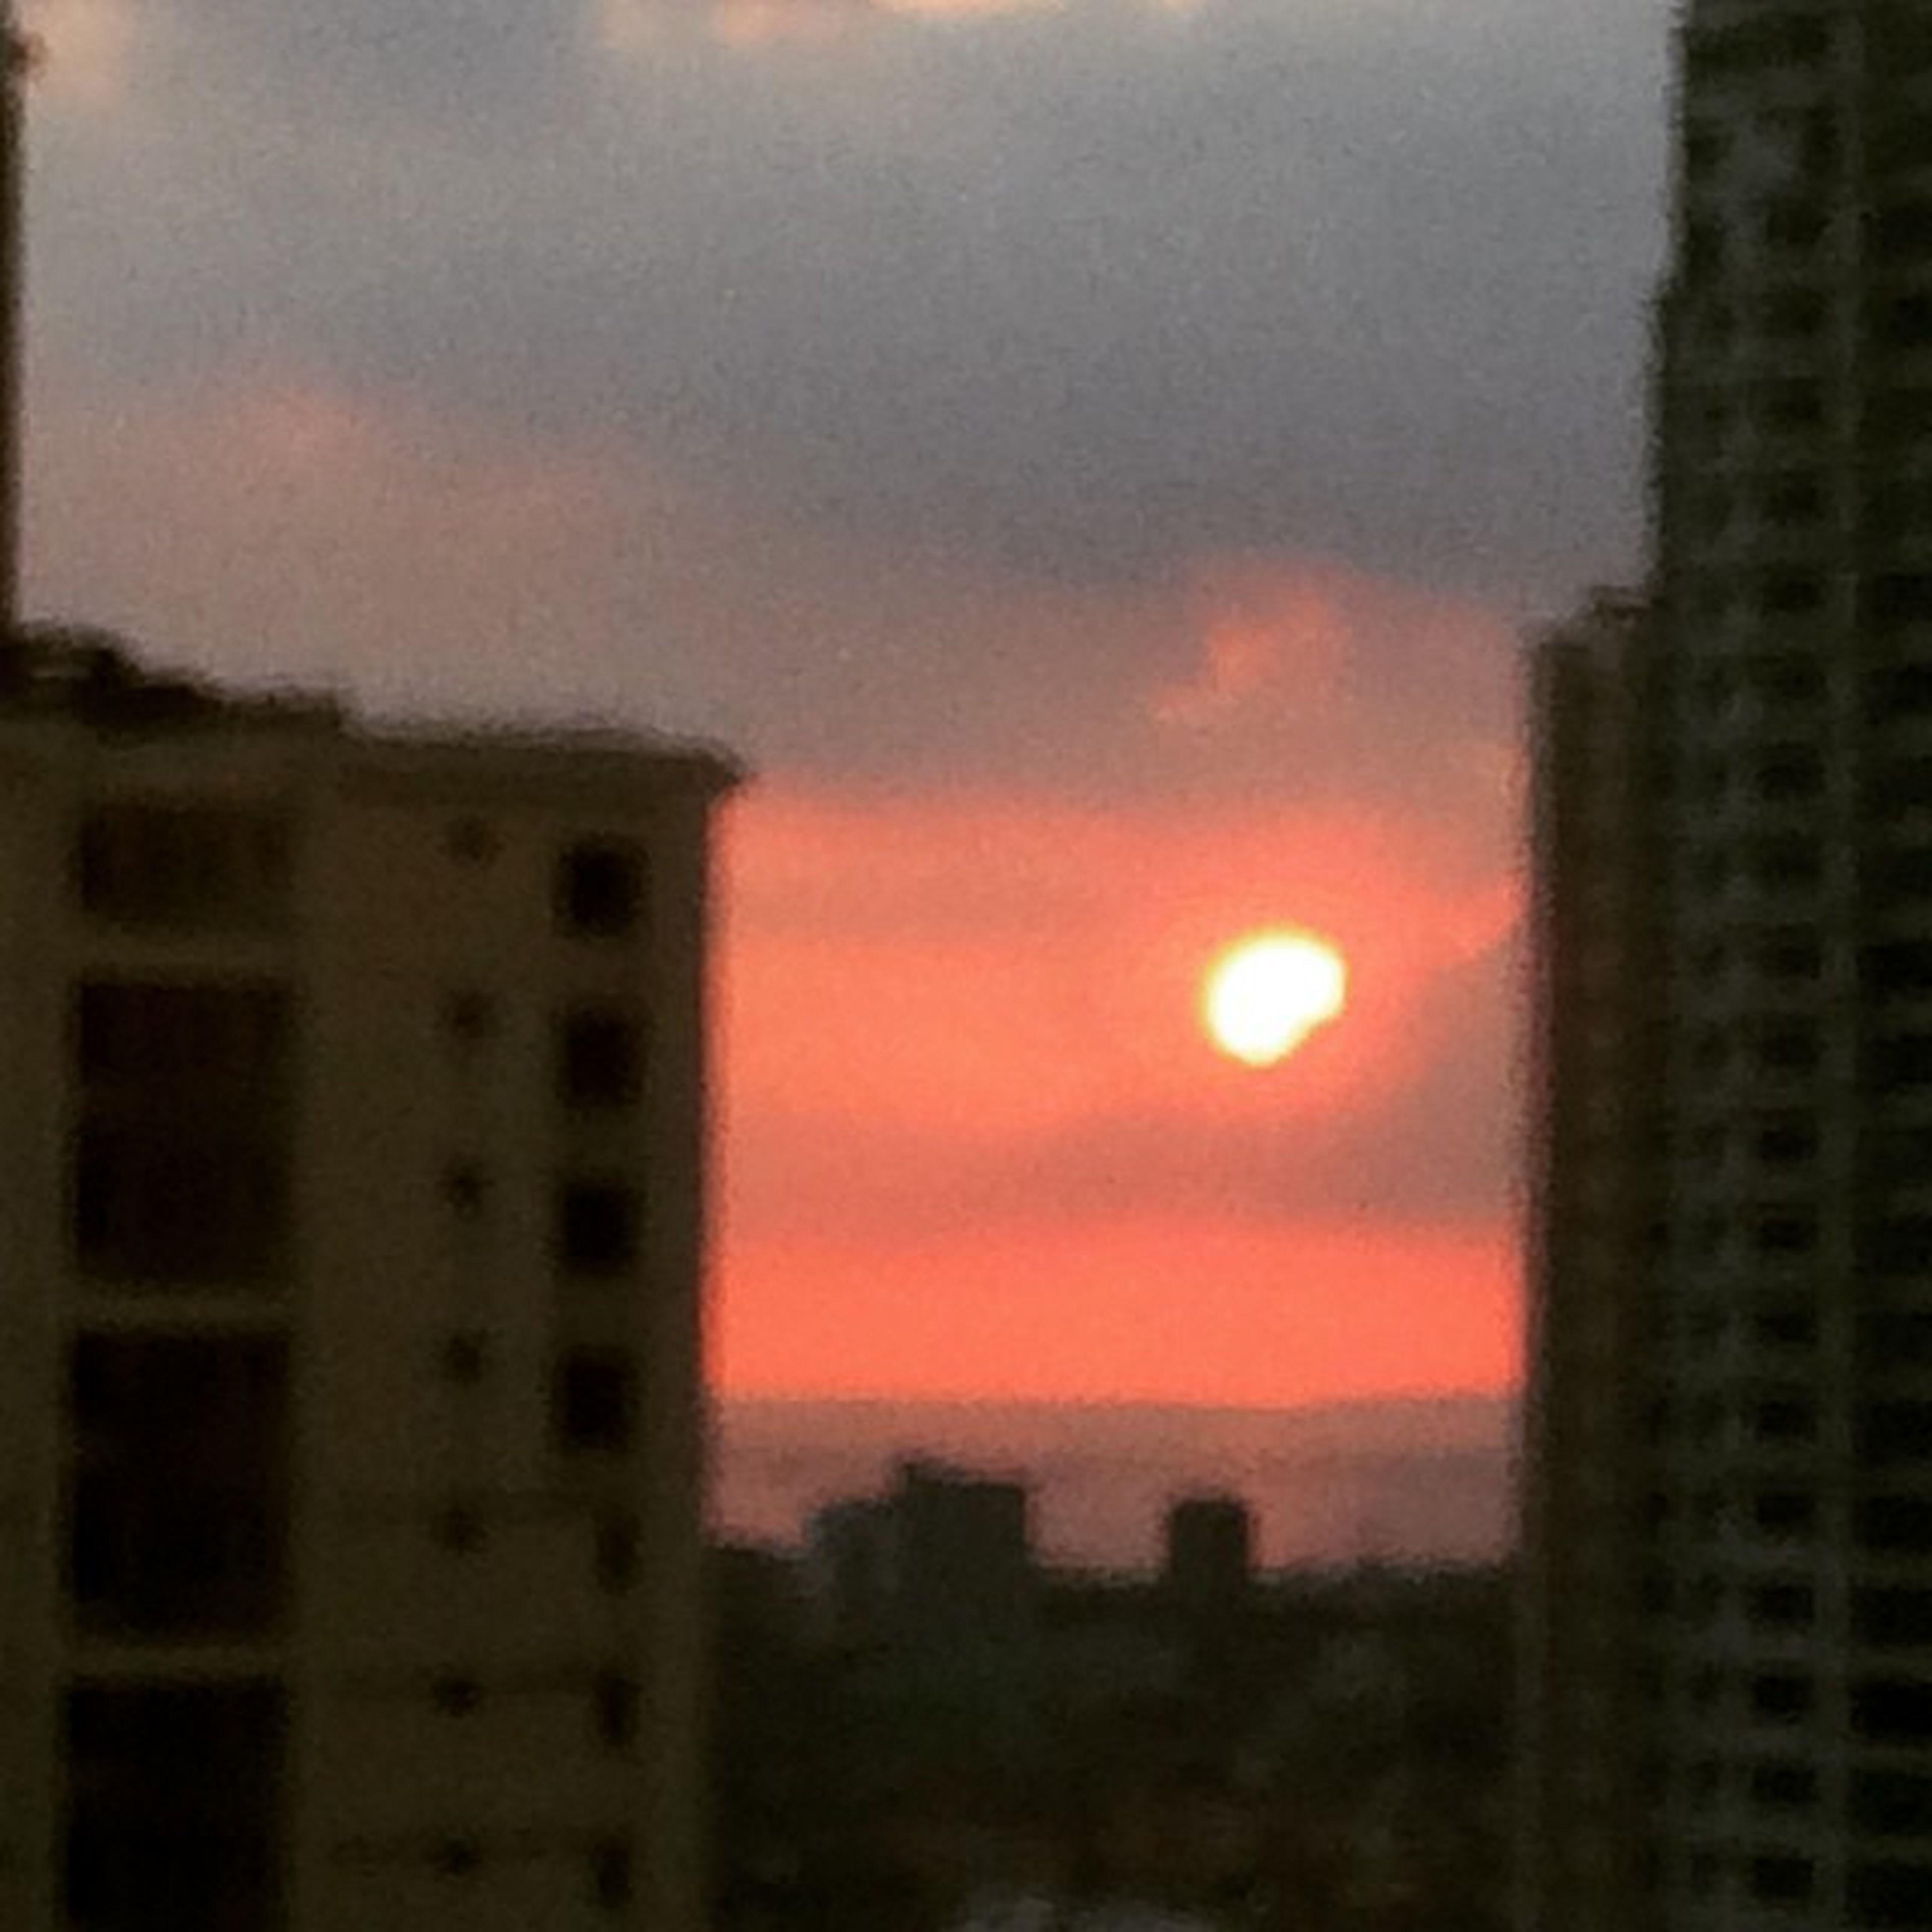 sunset, building exterior, architecture, orange color, built structure, sky, city, sun, cityscape, cloud - sky, silhouette, residential structure, scenics, no people, residential building, outdoors, nature, building, beauty in nature, dusk